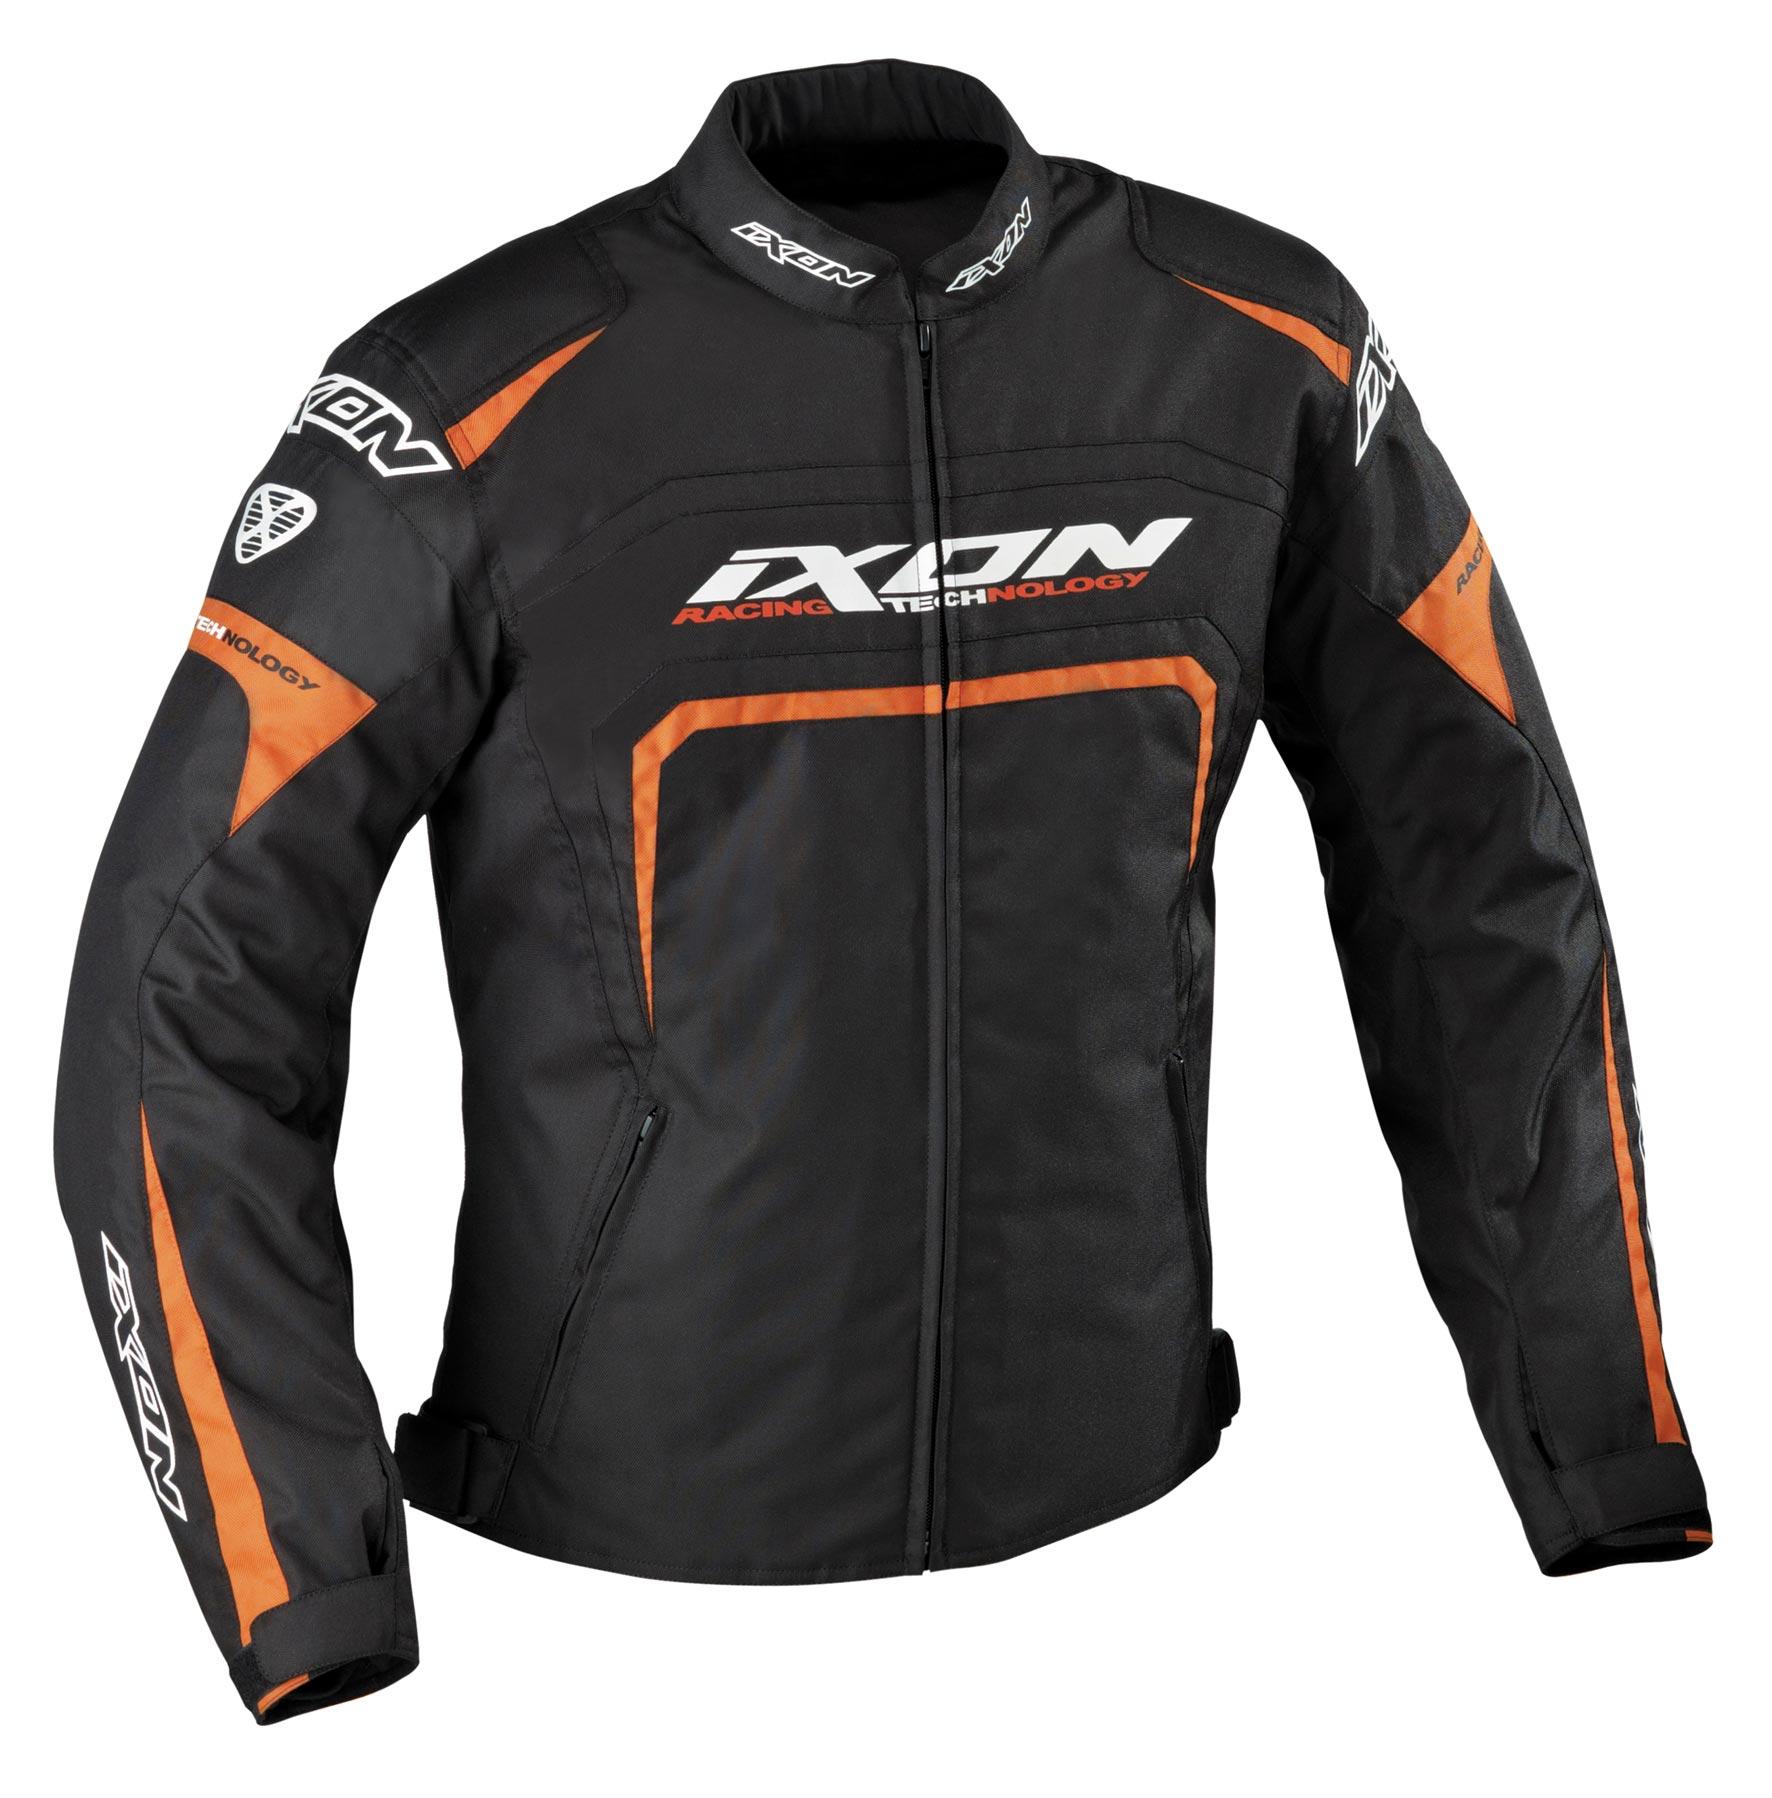 Ixon Eagar and Lover Jacket